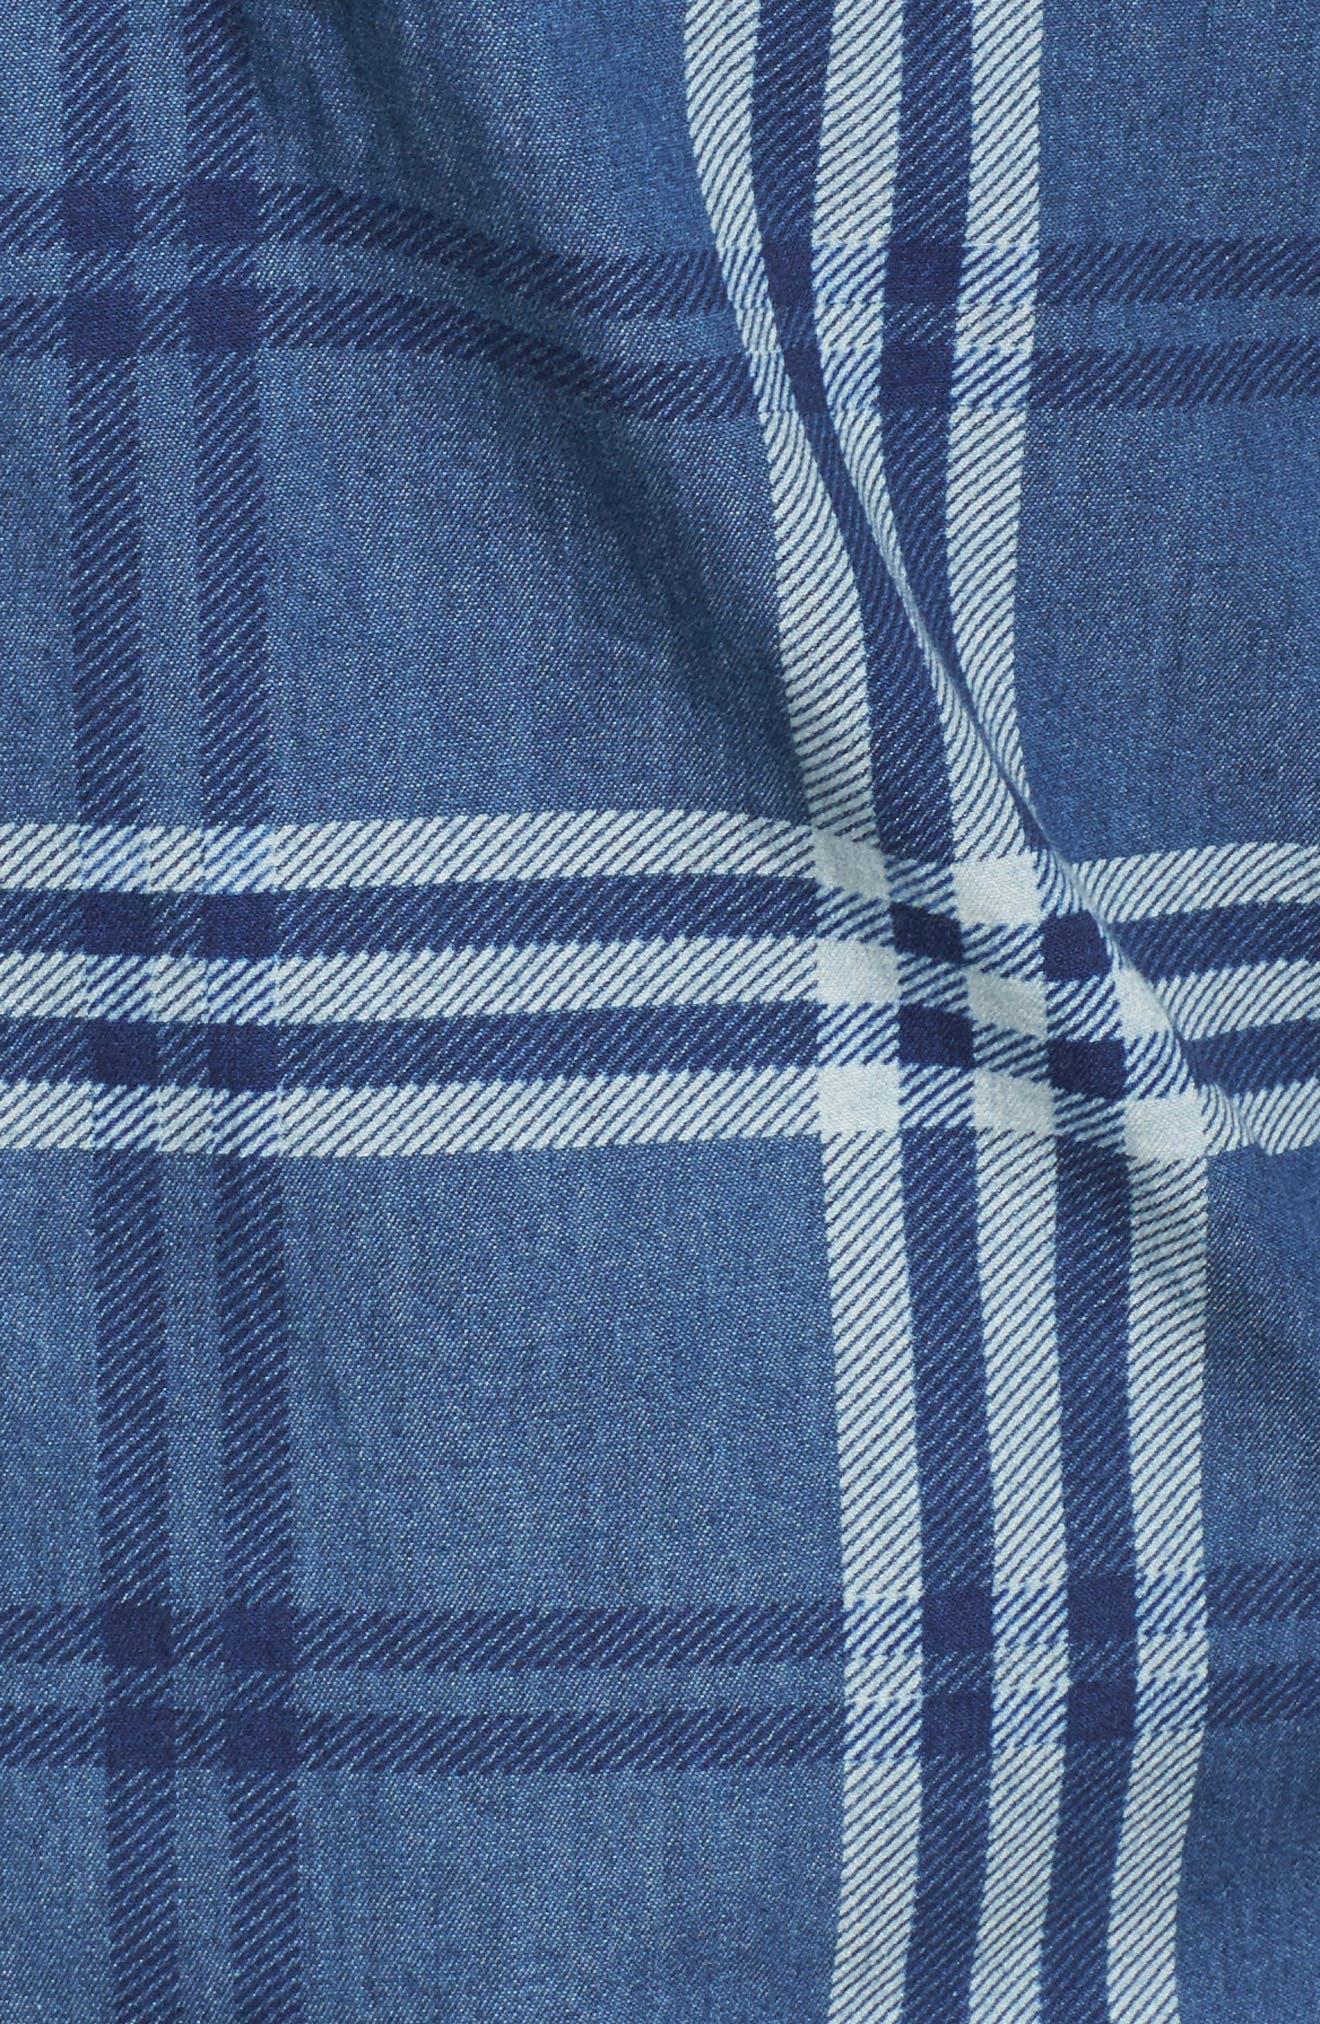 Breckenridge Plaid Sport Shirt,                             Alternate thumbnail 5, color,                             Abyss